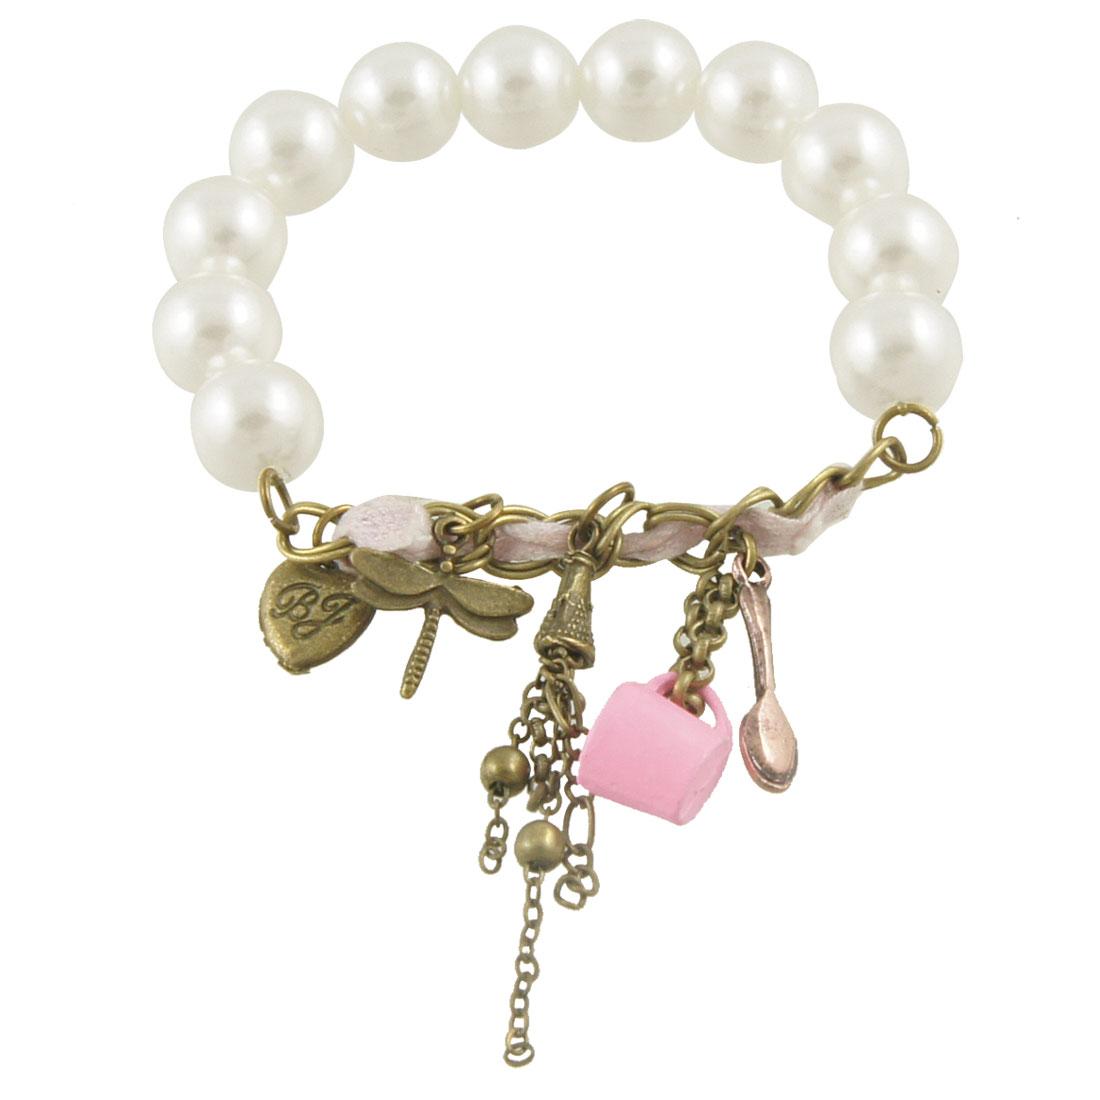 Lady Plastic Round Beaded Stretchy String Wrist Bracelet White